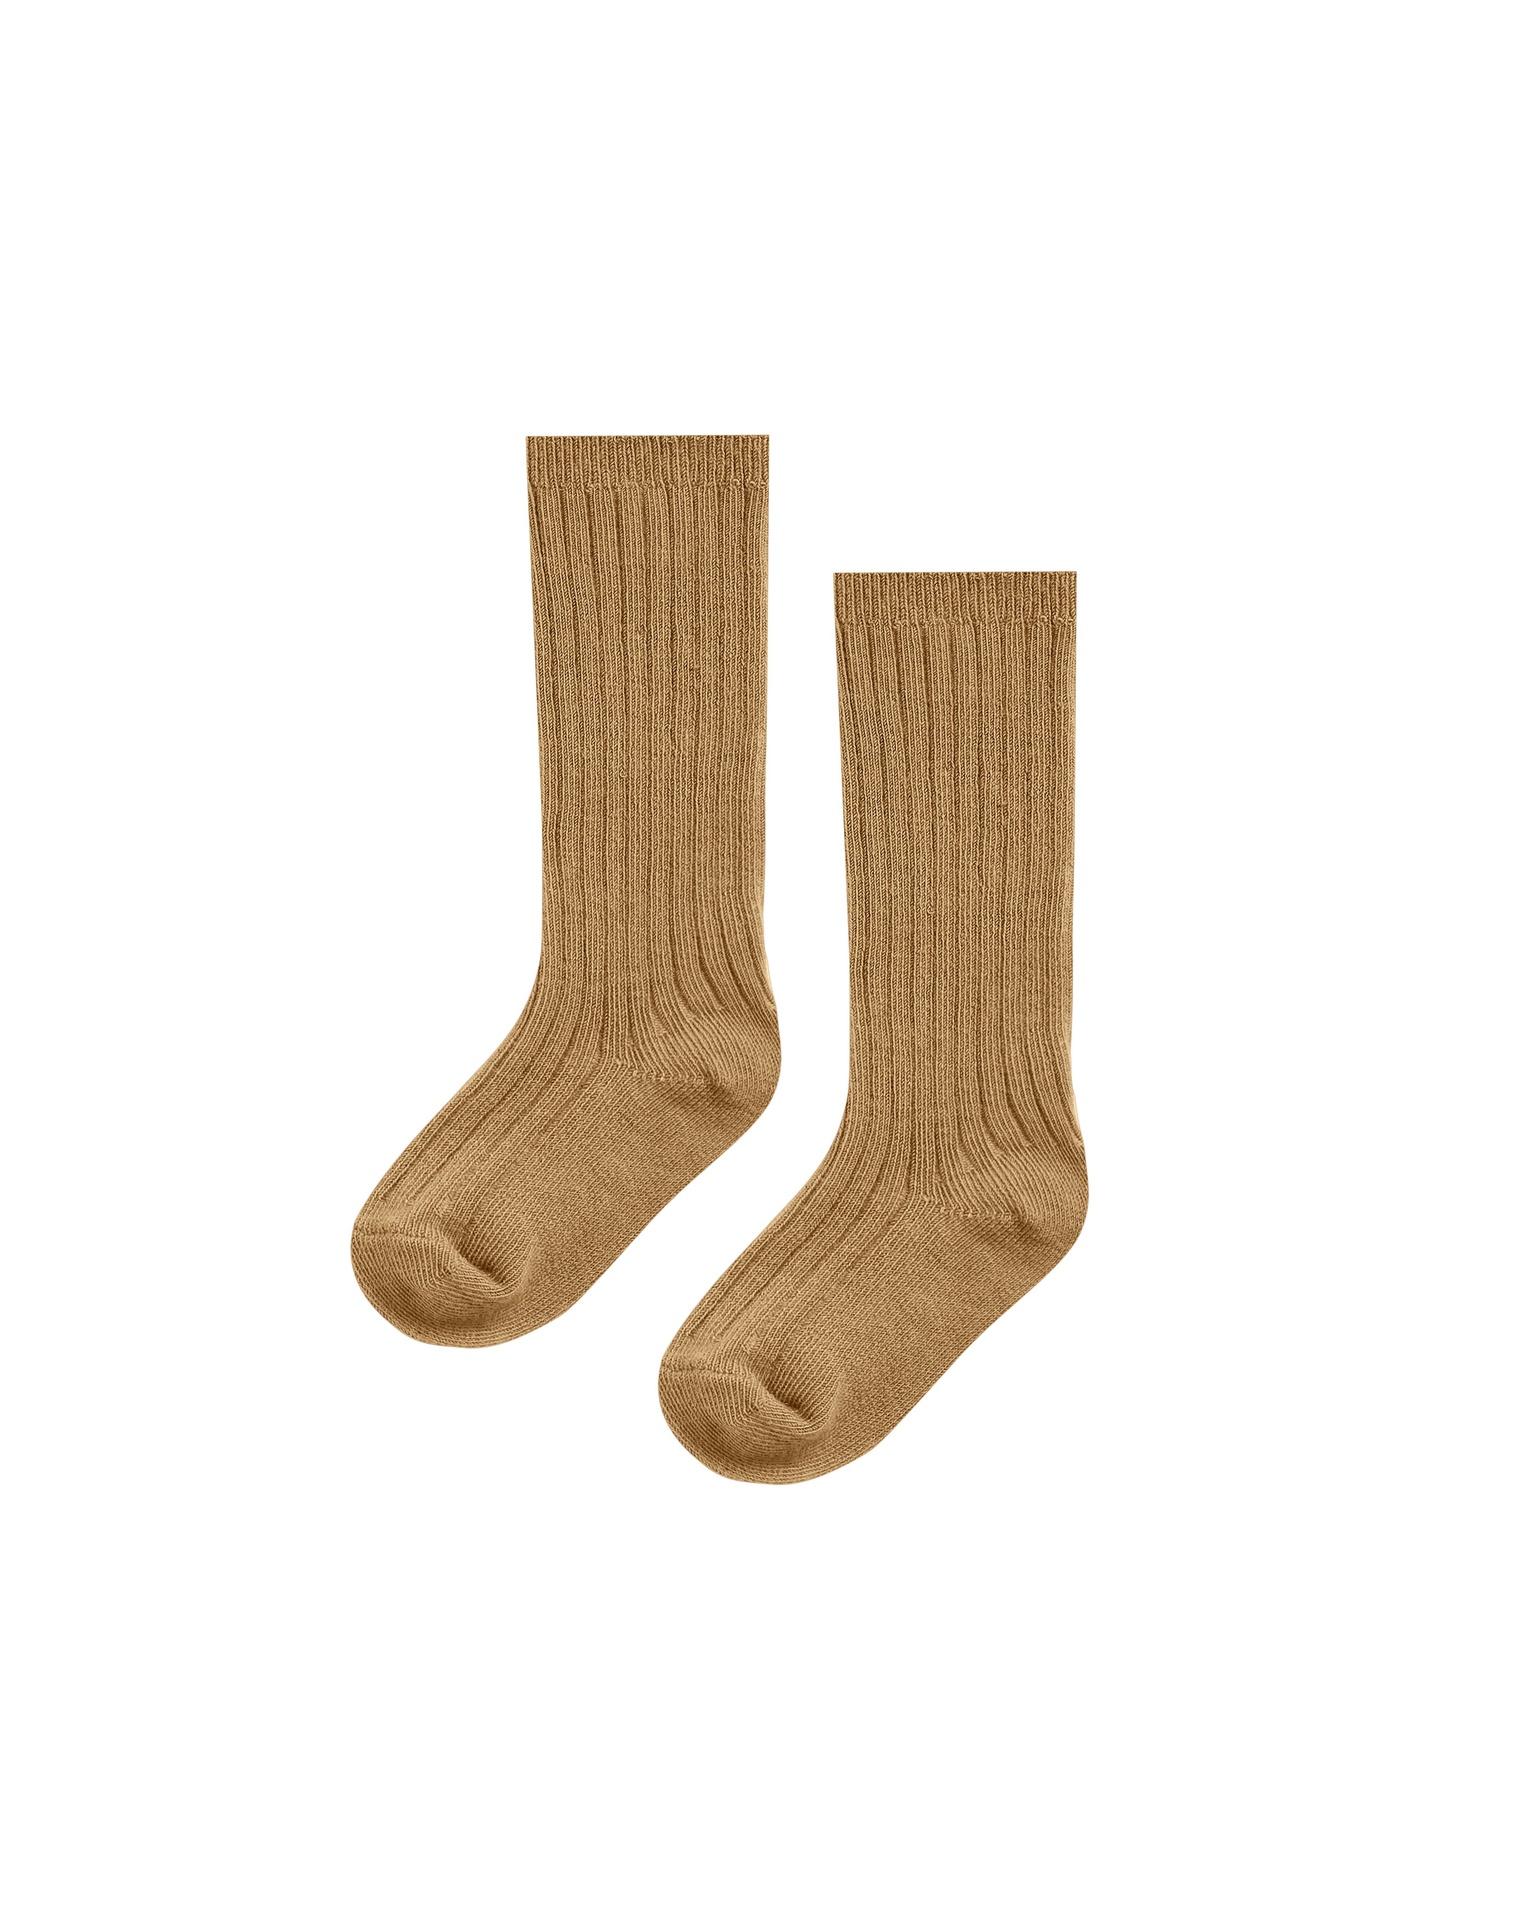 Rylee and Cru Knee High Socks 3pk (wine, goldenrod,forest)